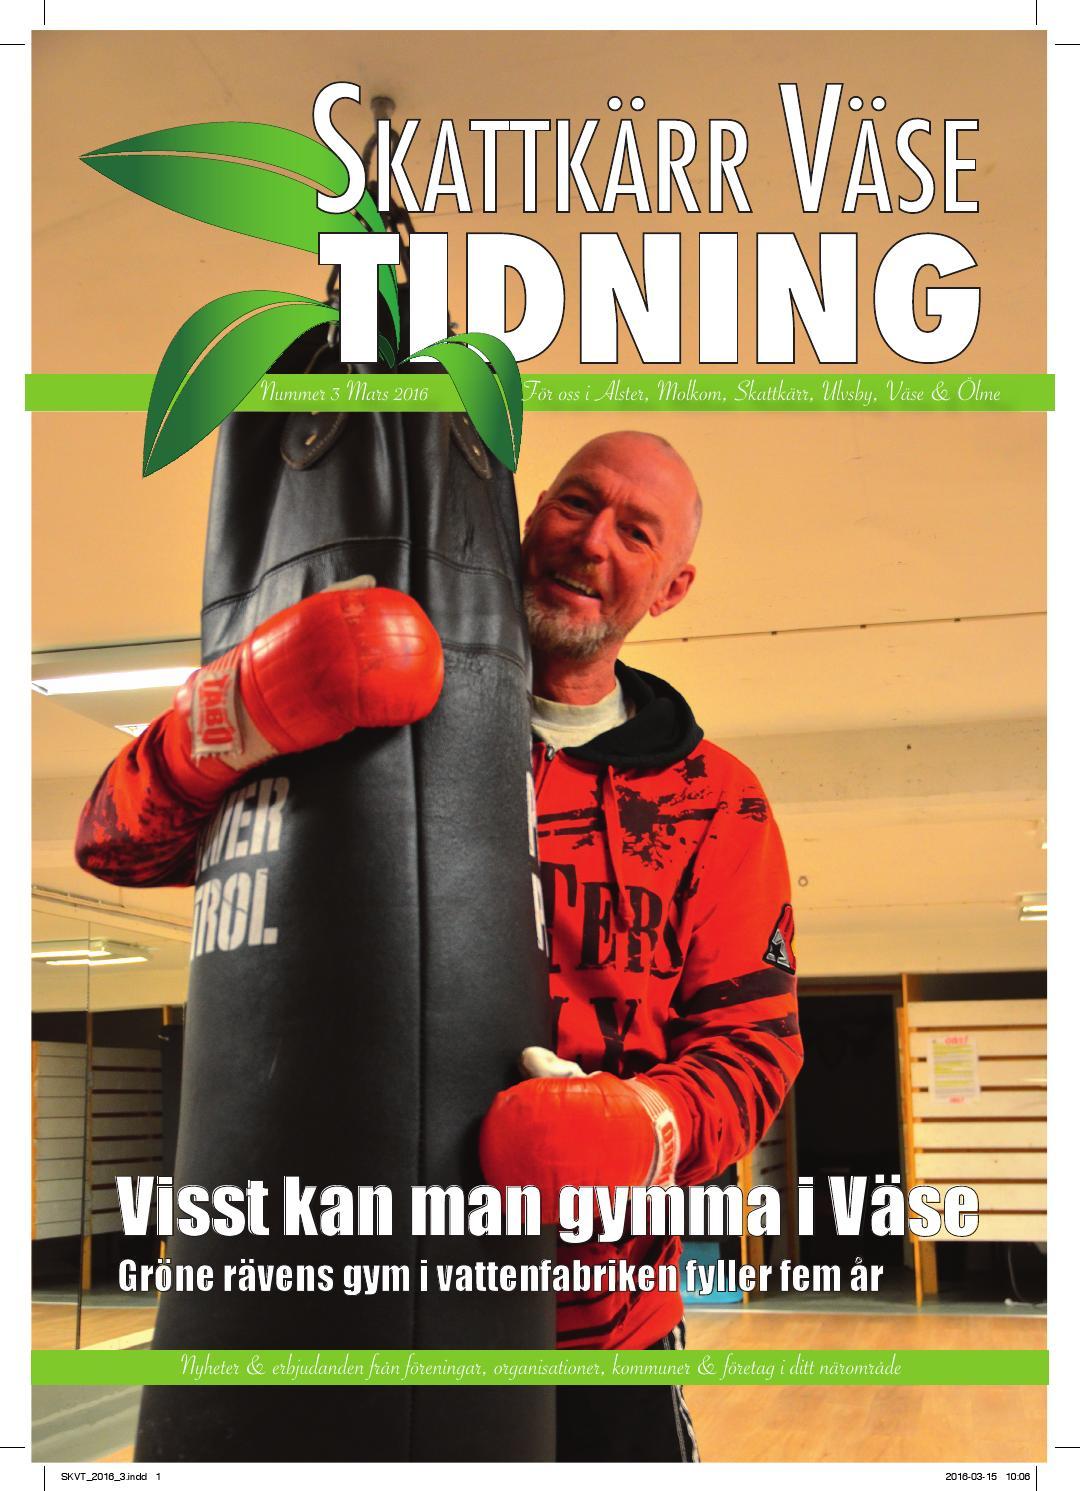 Per Ahlbck, 61 r i Vse p Fridhemsgatan 4 - satisfaction-survey.net